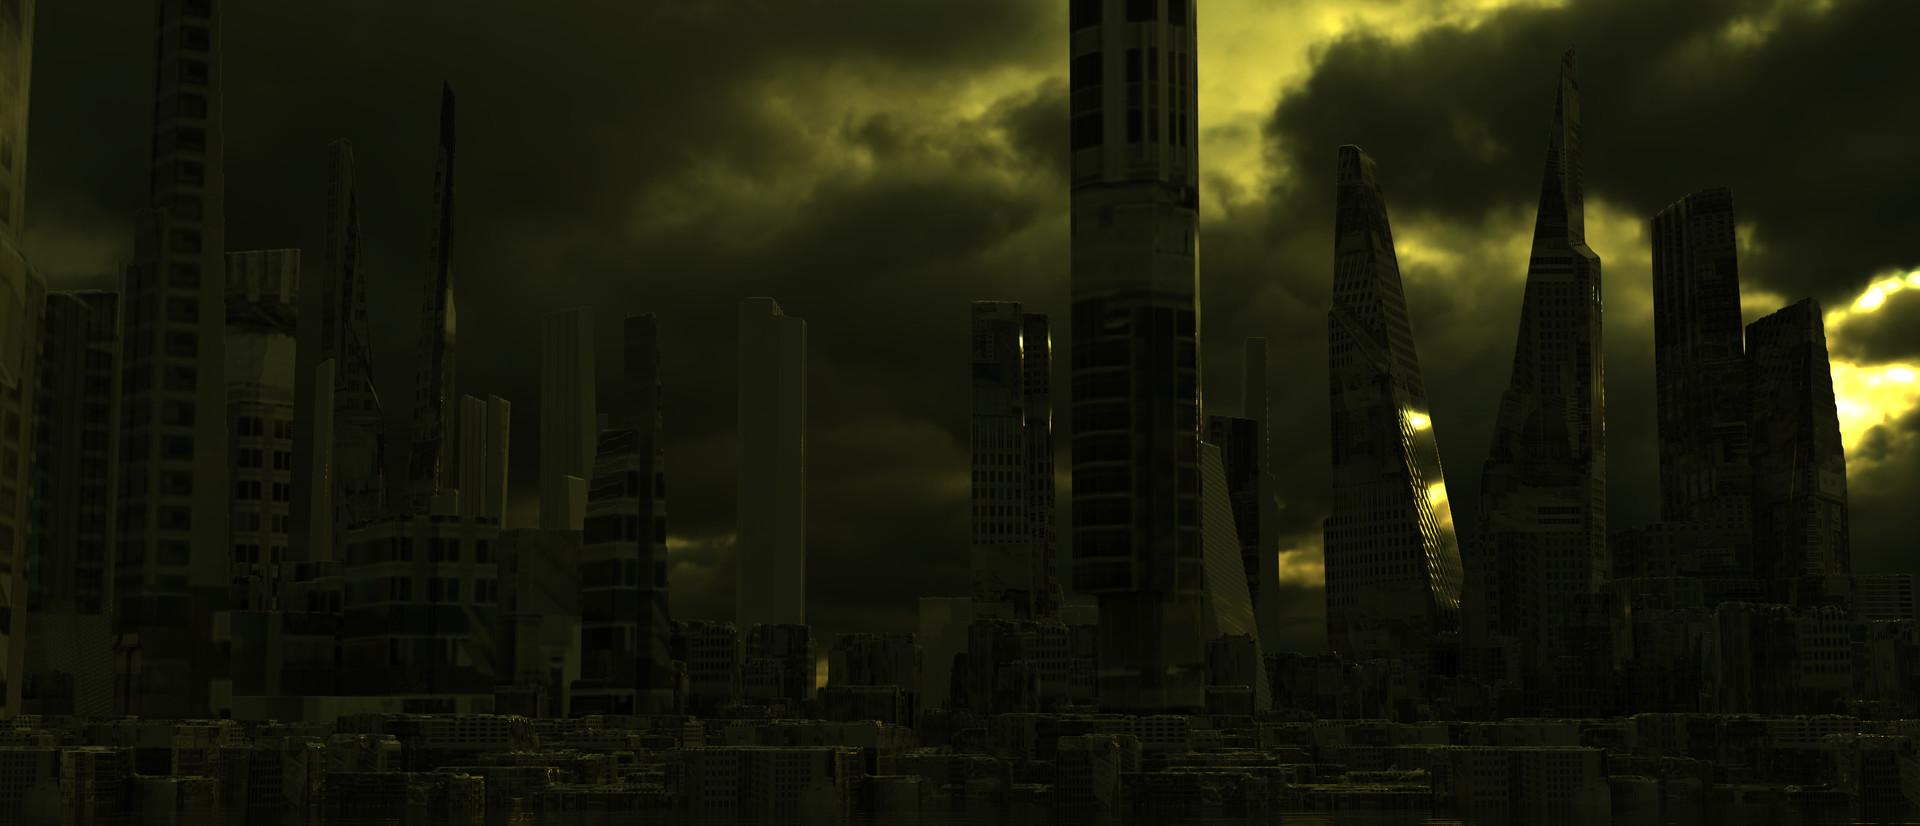 Duncan halleck scifi city 4